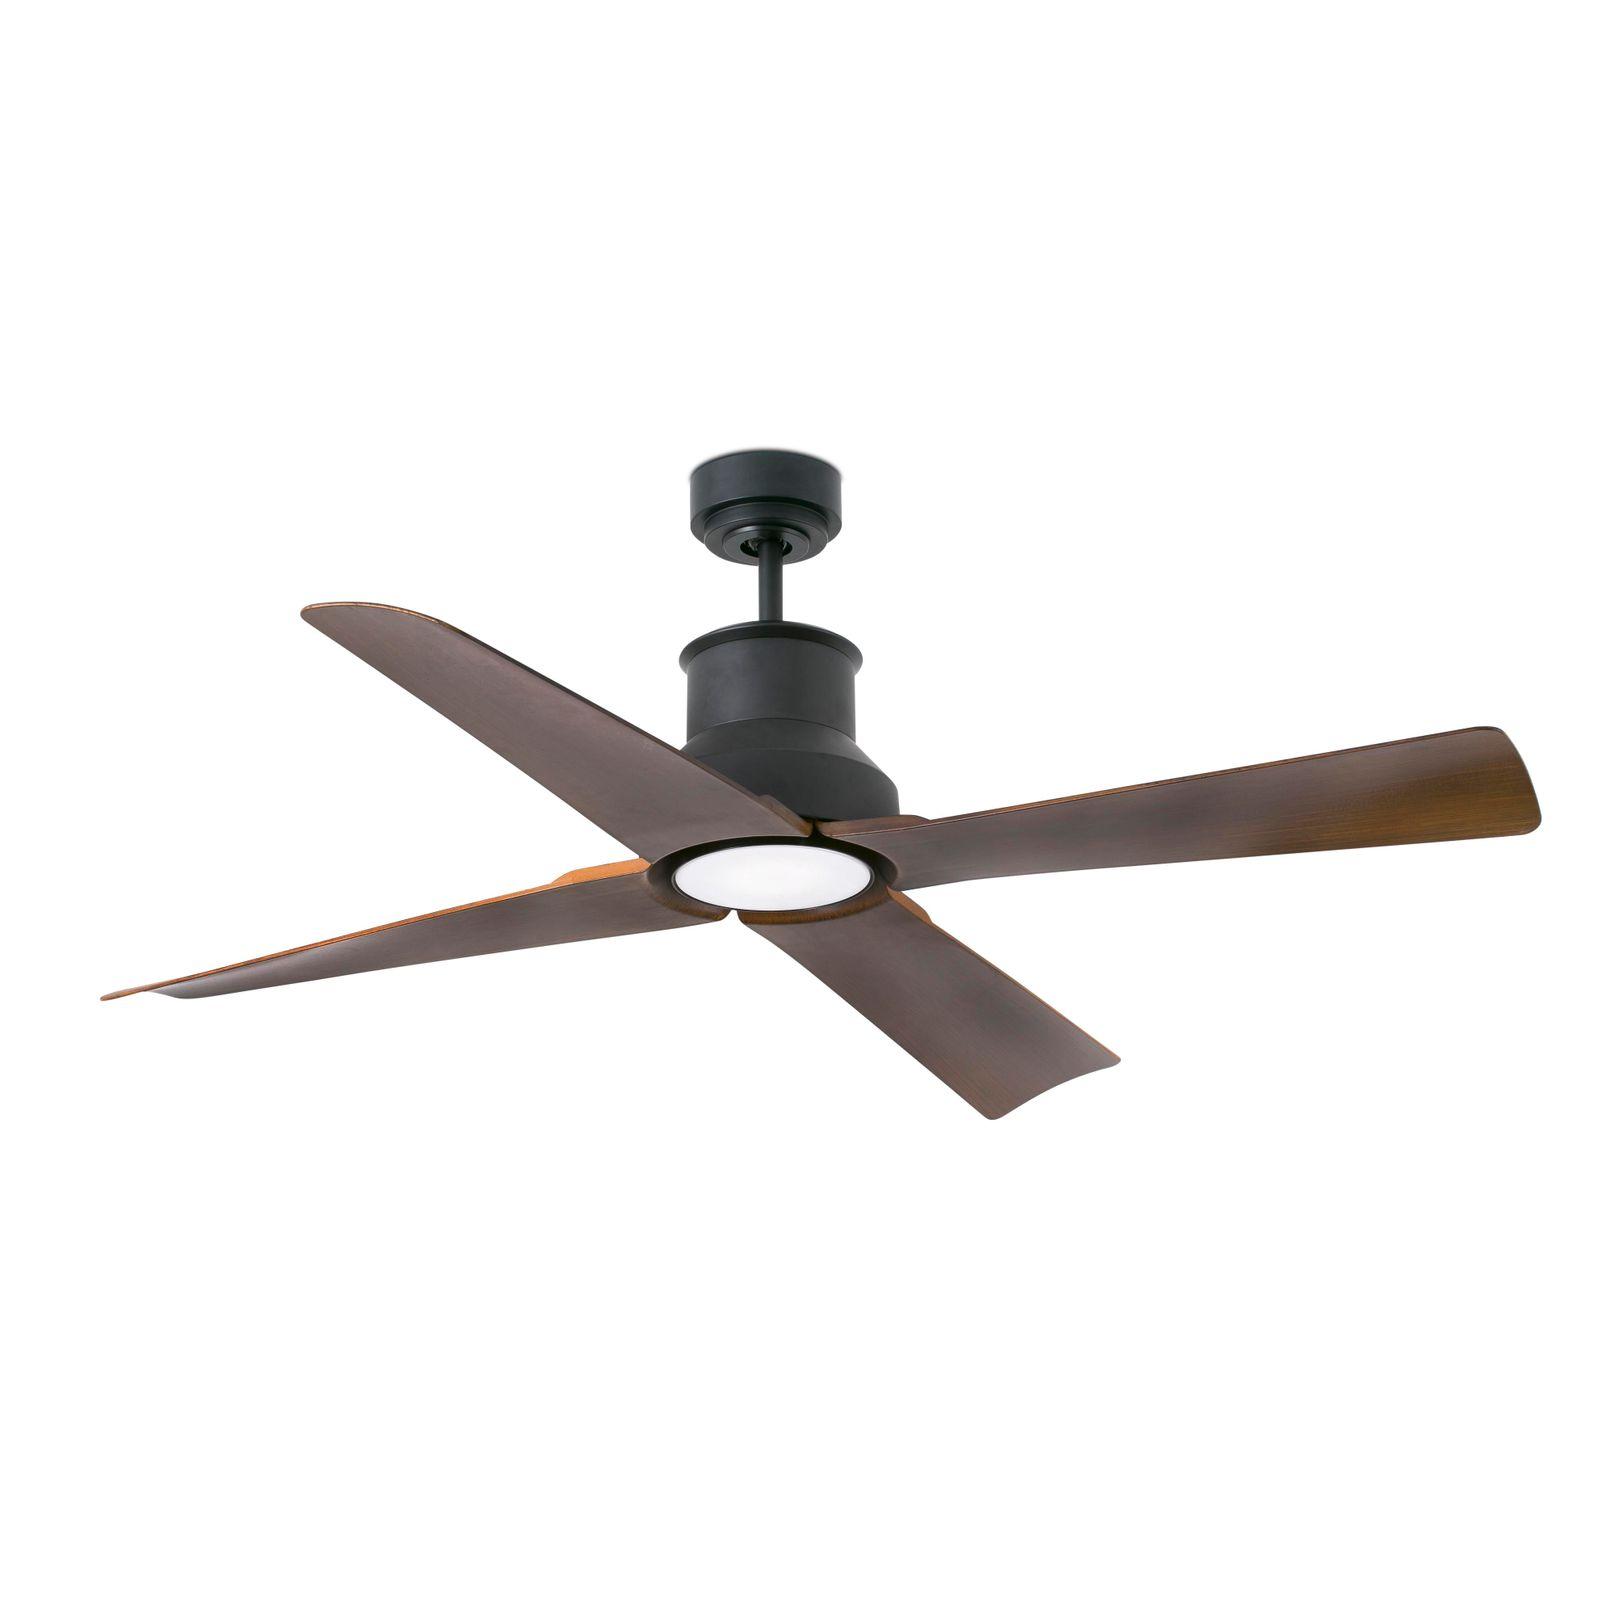 Faro energy saving LED ceiling fan Winche black IP44 Ceiling fans